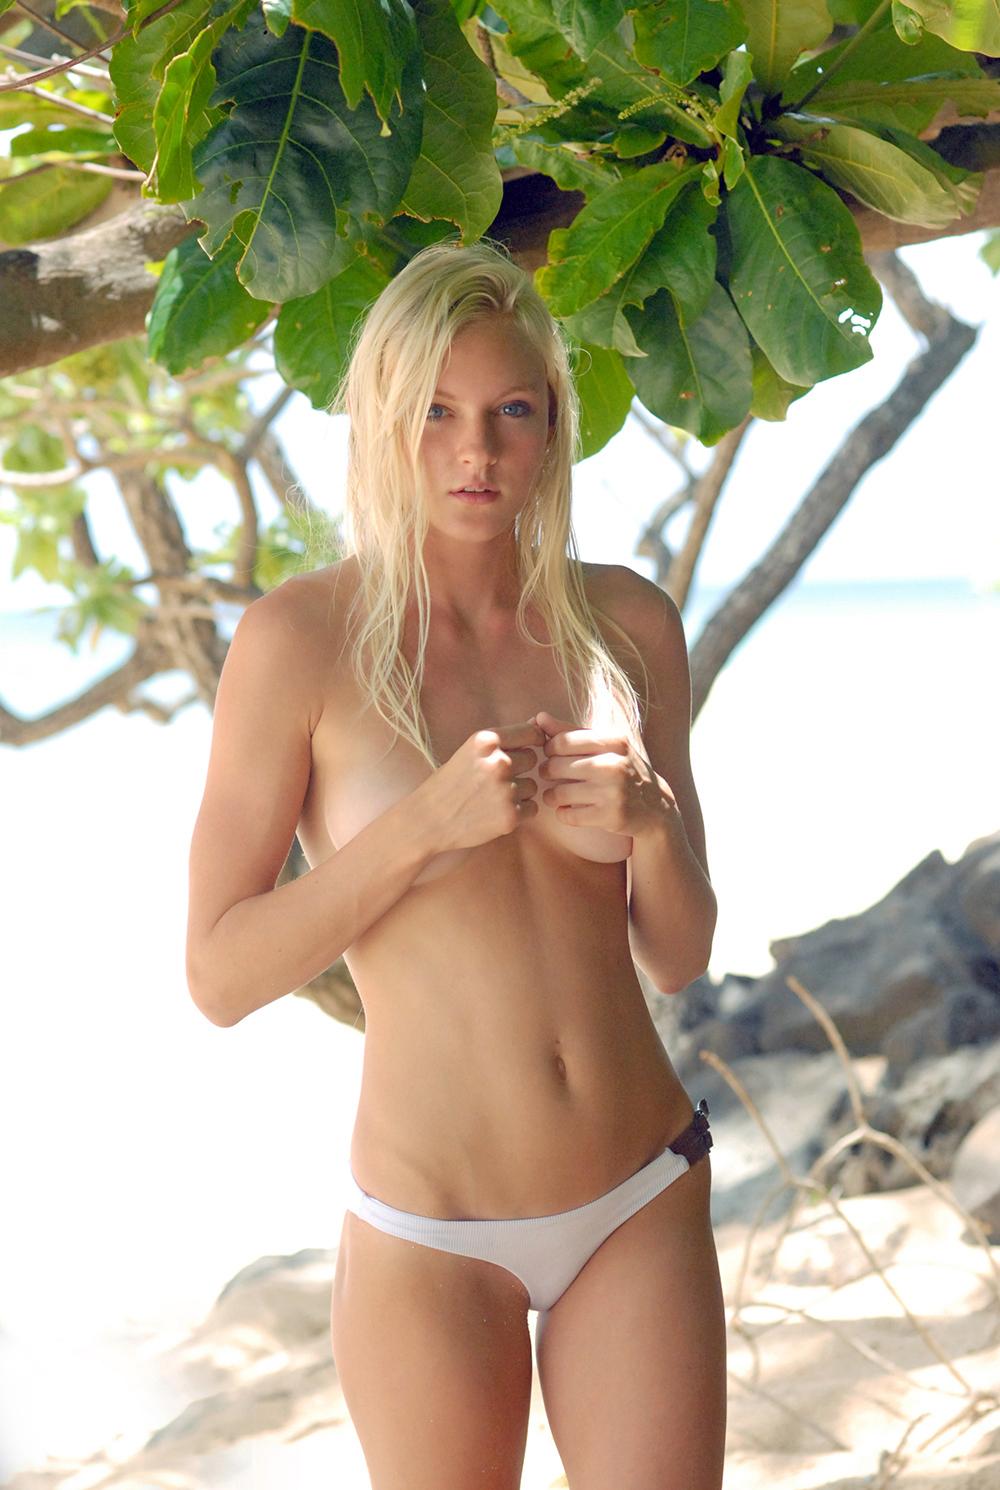 Swimbook_swimsuit_Red_Velvet_by_Nicole_Marcella_with_Katie_Pentz_DSC_0303.jpg